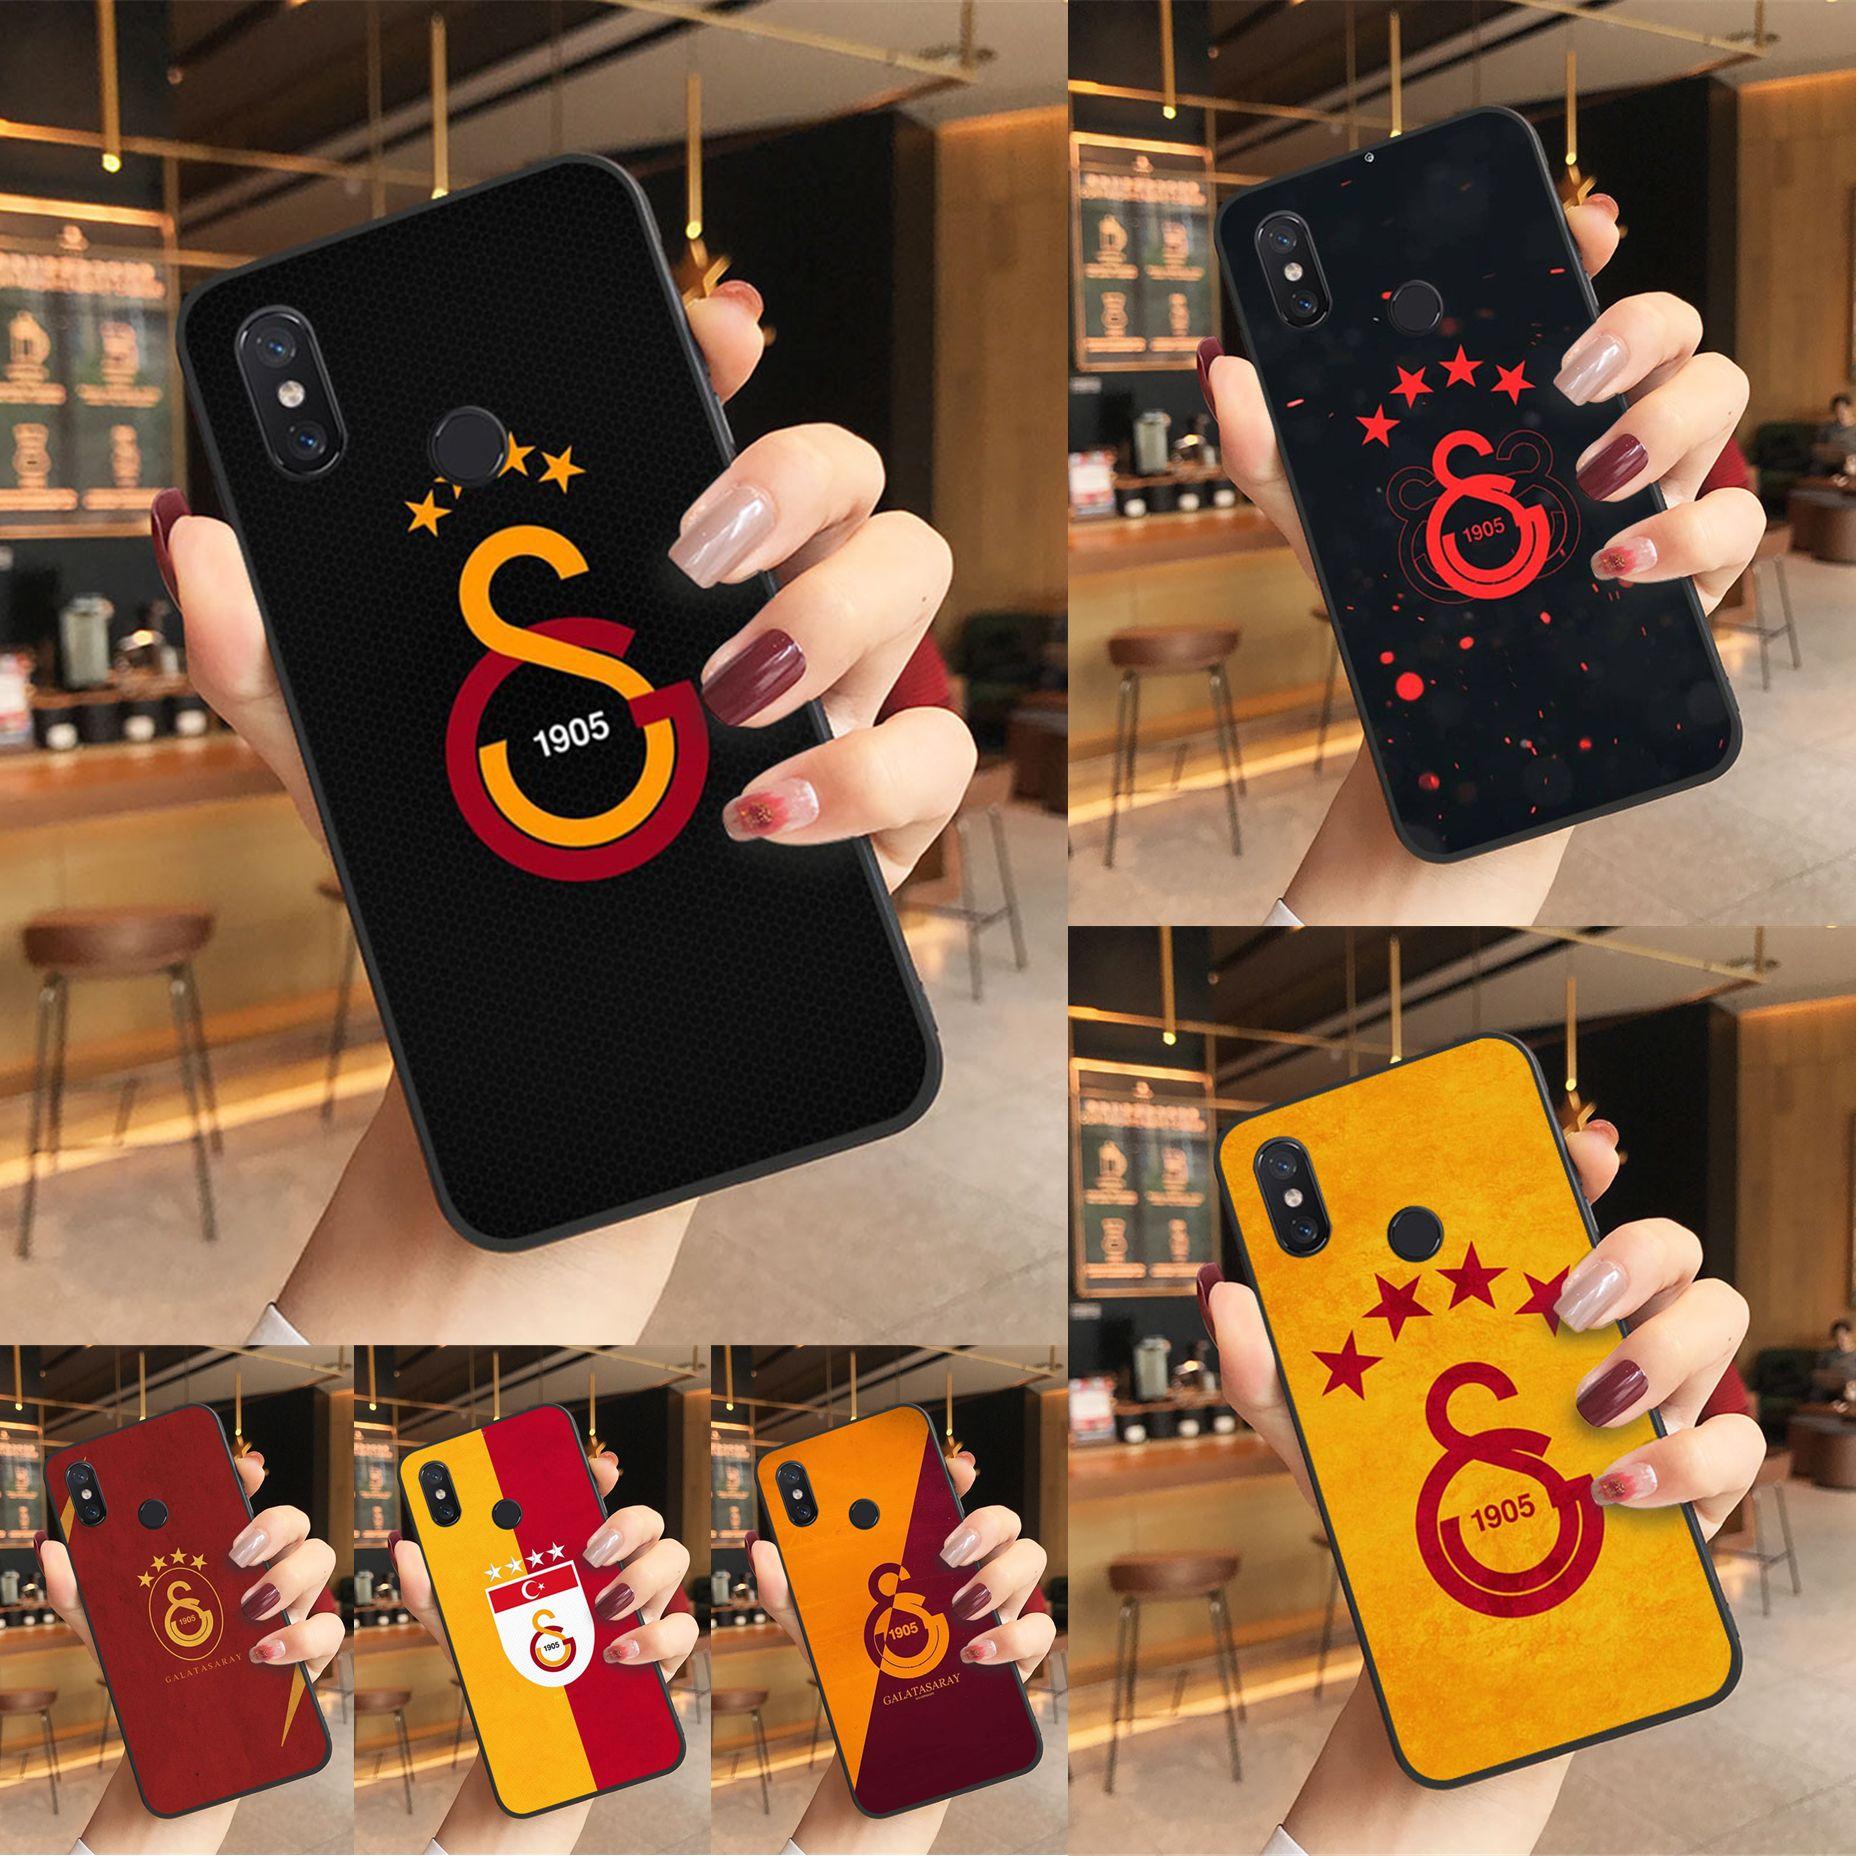 Turkey Galatasaray DIY Luxury High-end phone Case for Xiaomi 5 6 6plus 6x 8 8se 8lite 9 9se case